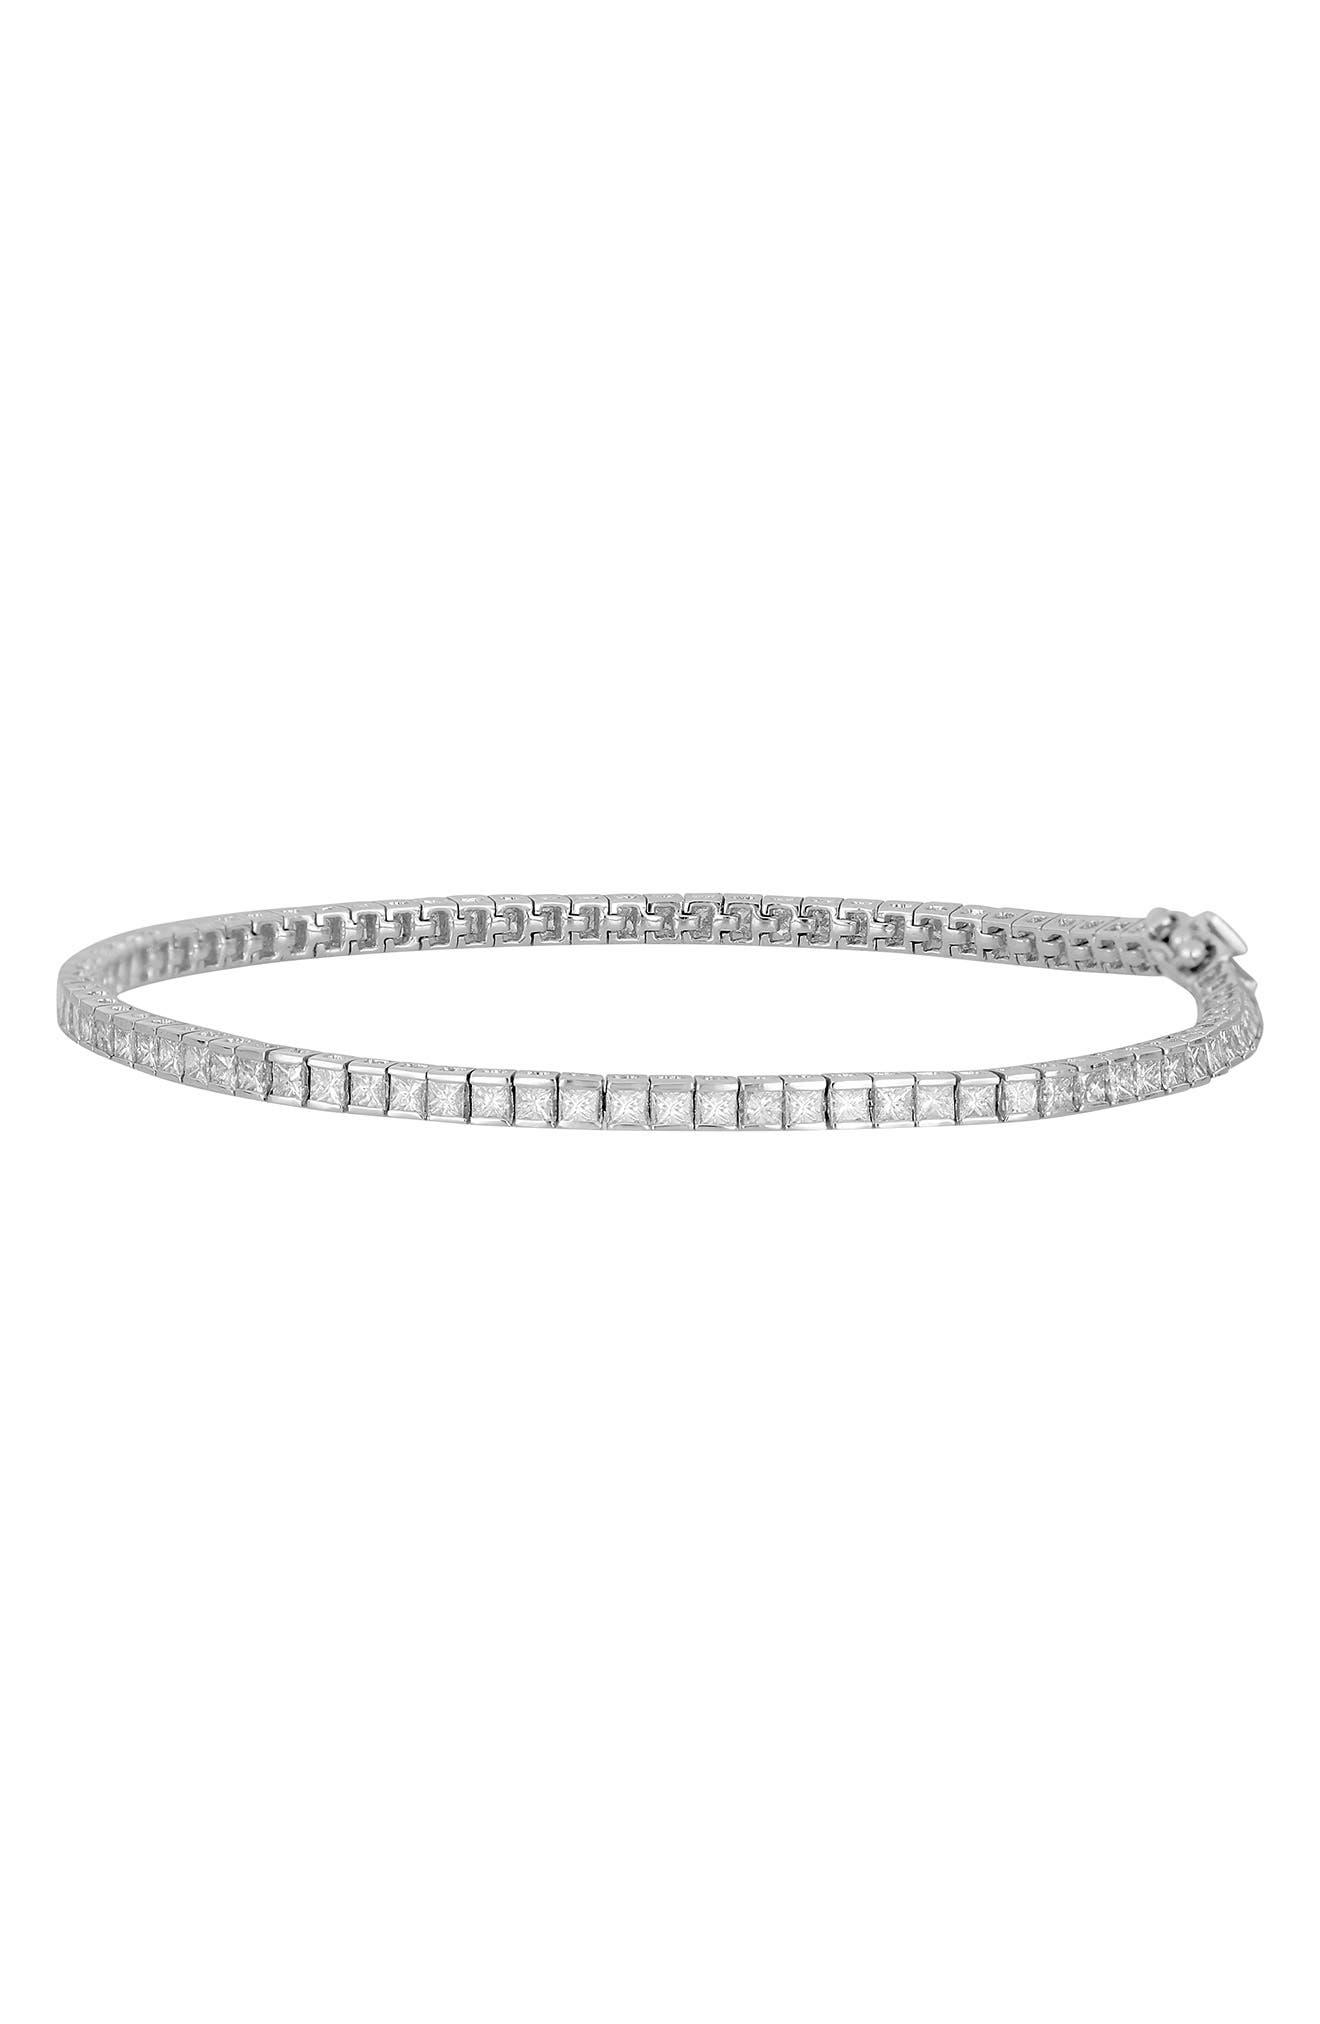 Diamond Line Bracelet,                             Main thumbnail 1, color,                             101